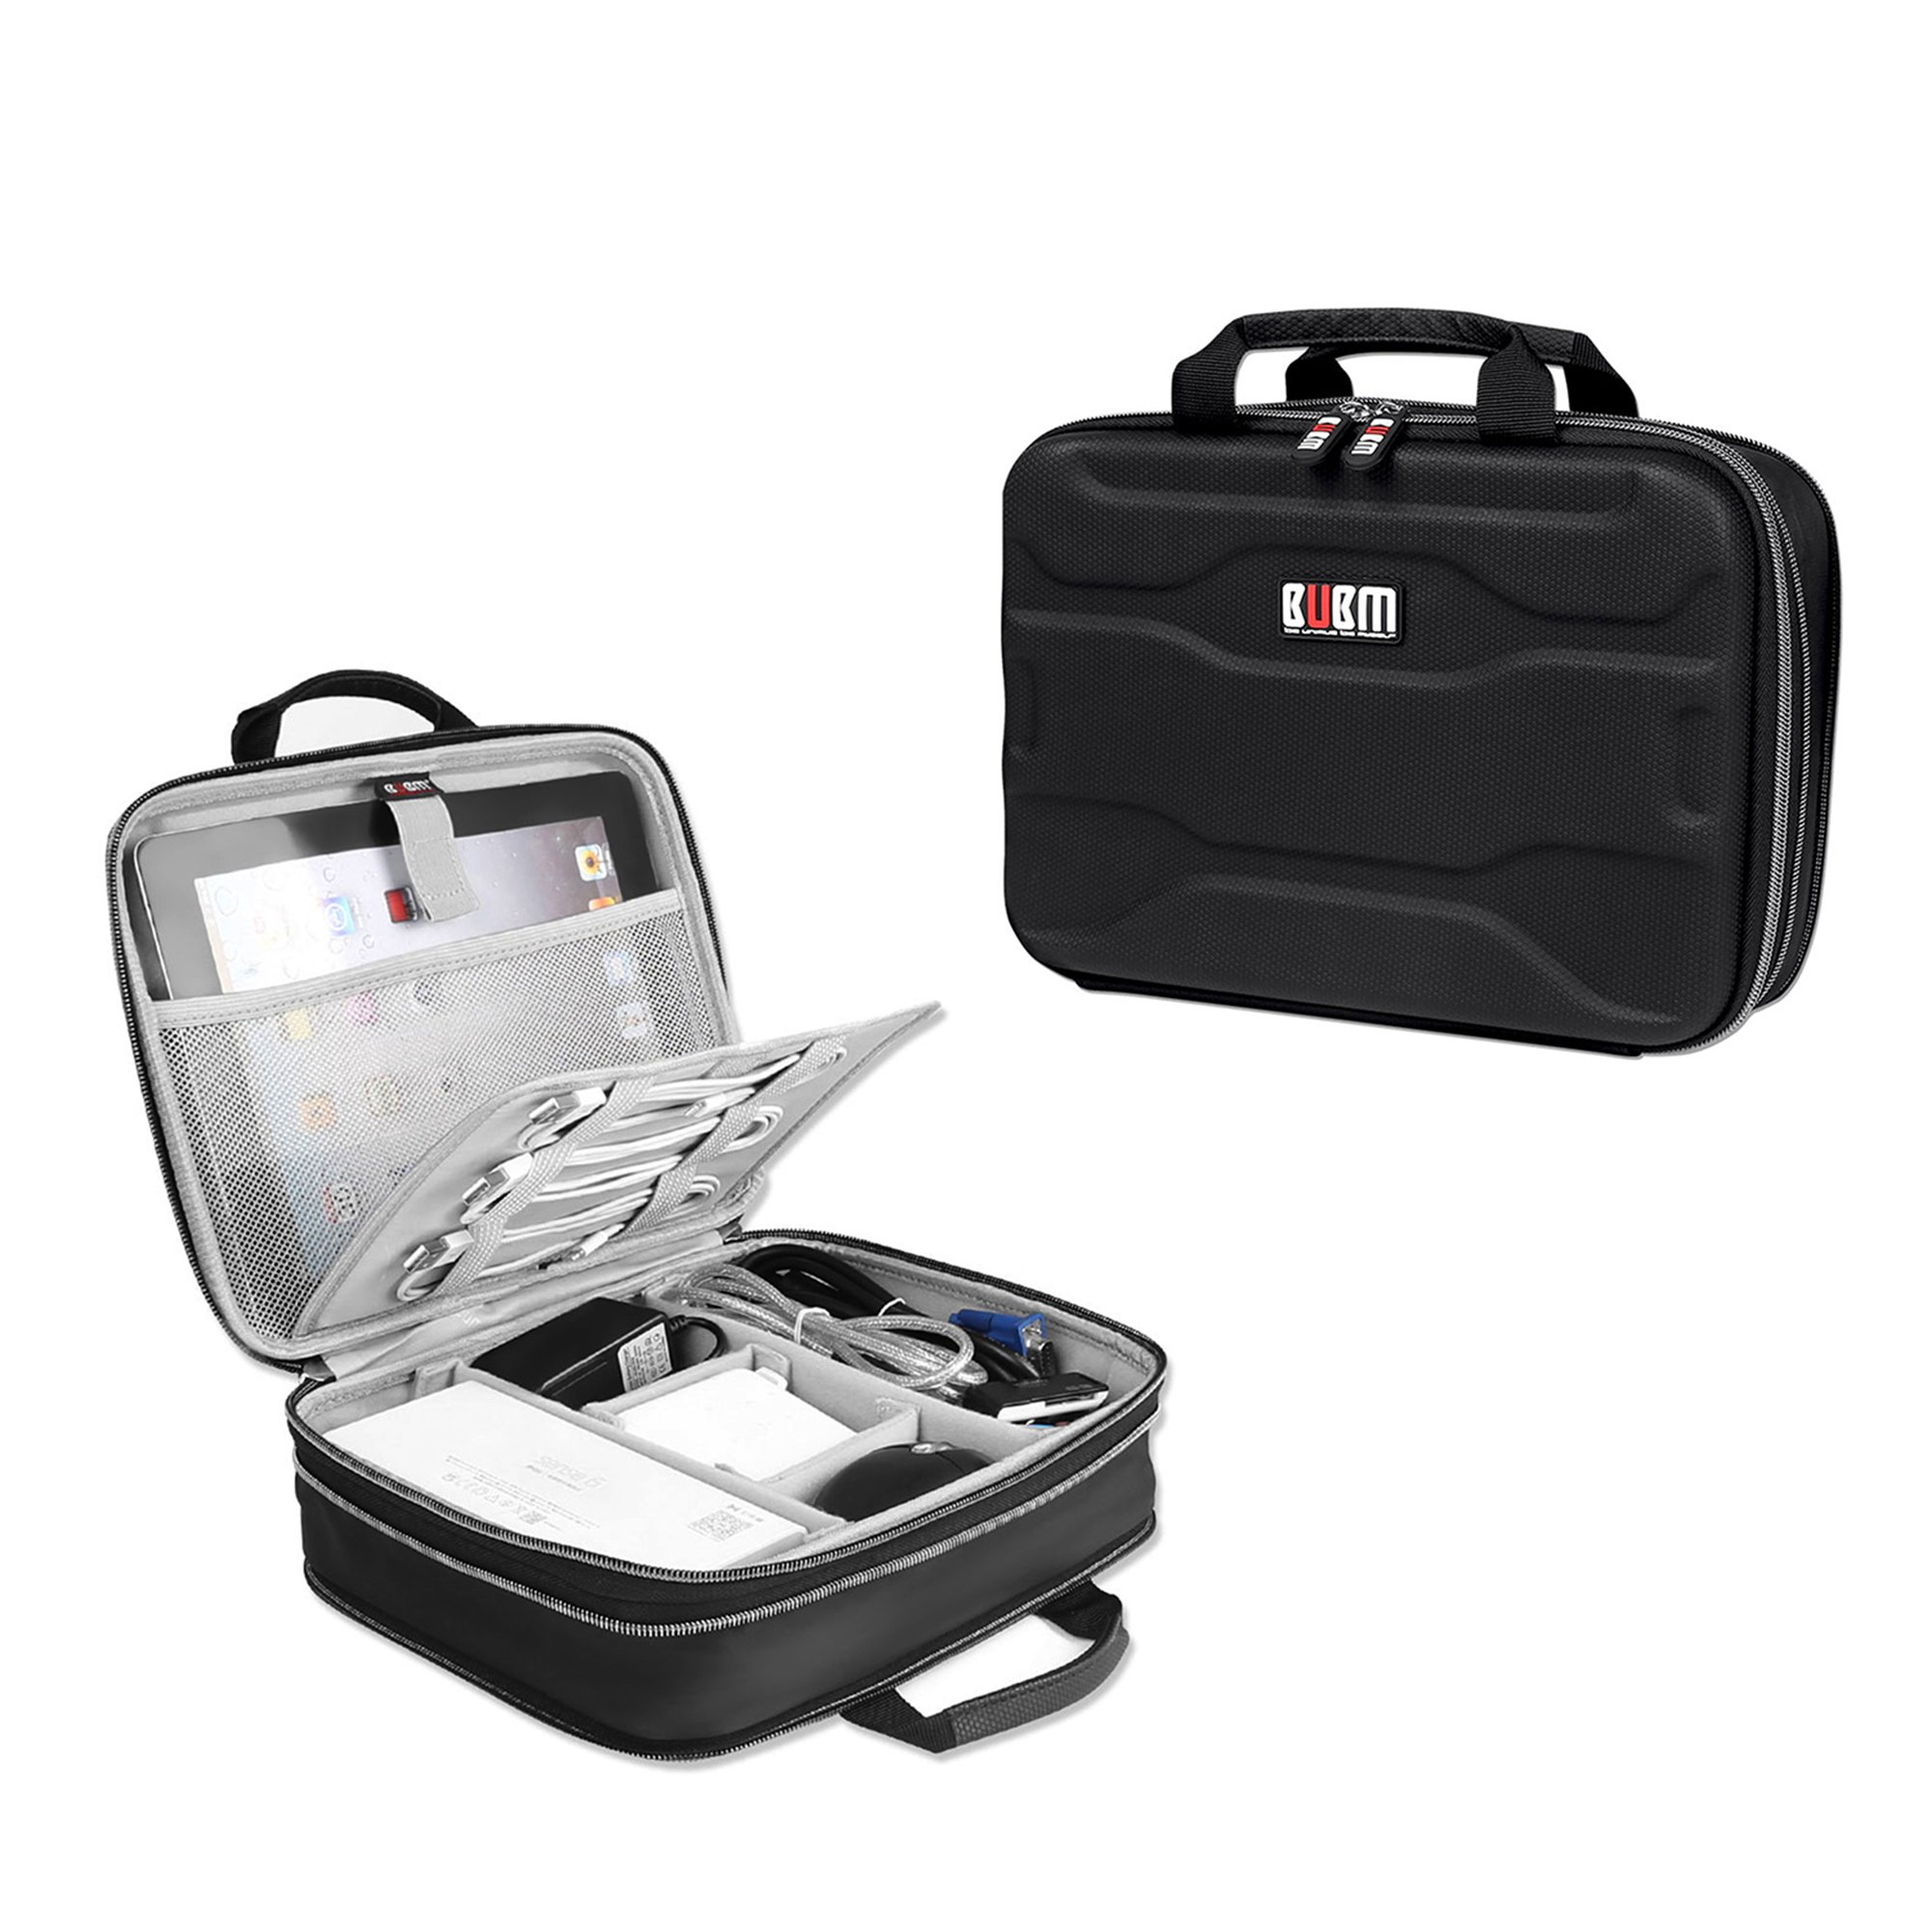 Travel Bag Organizer Electronics Organizer - BUBM Cable Organizer Storage Bag for iPad Mini,Power Bank,USB Cable,Flash,Hard Drive, Portable Hard Shell Travel Gadget Bag,2 Year Warranty(S) by BUBM